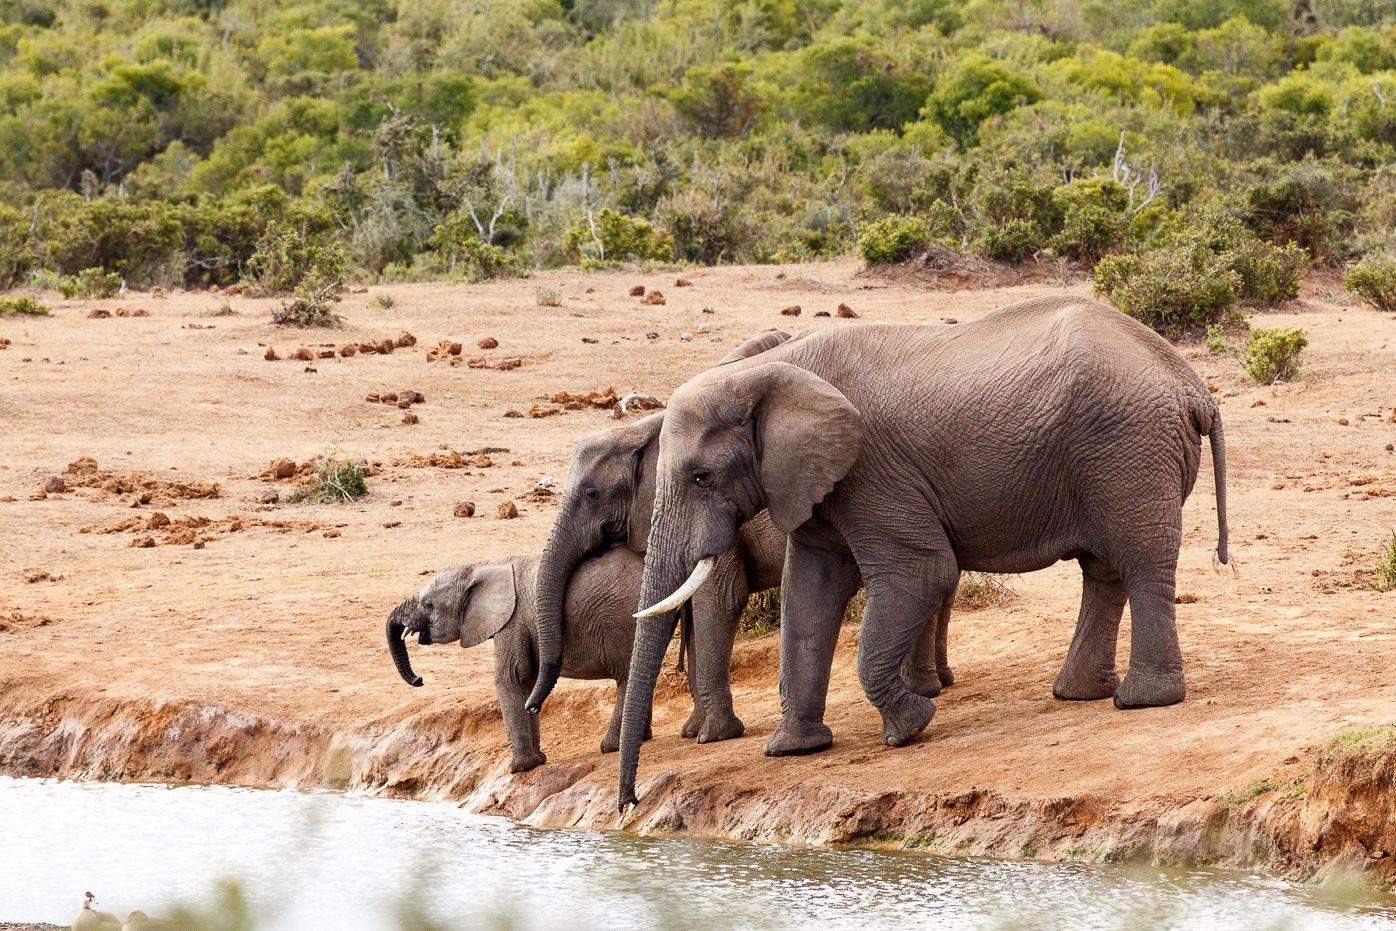 African Bush Elephants loving family gathering African Bush Elephants loving family gathering at the watering hole.